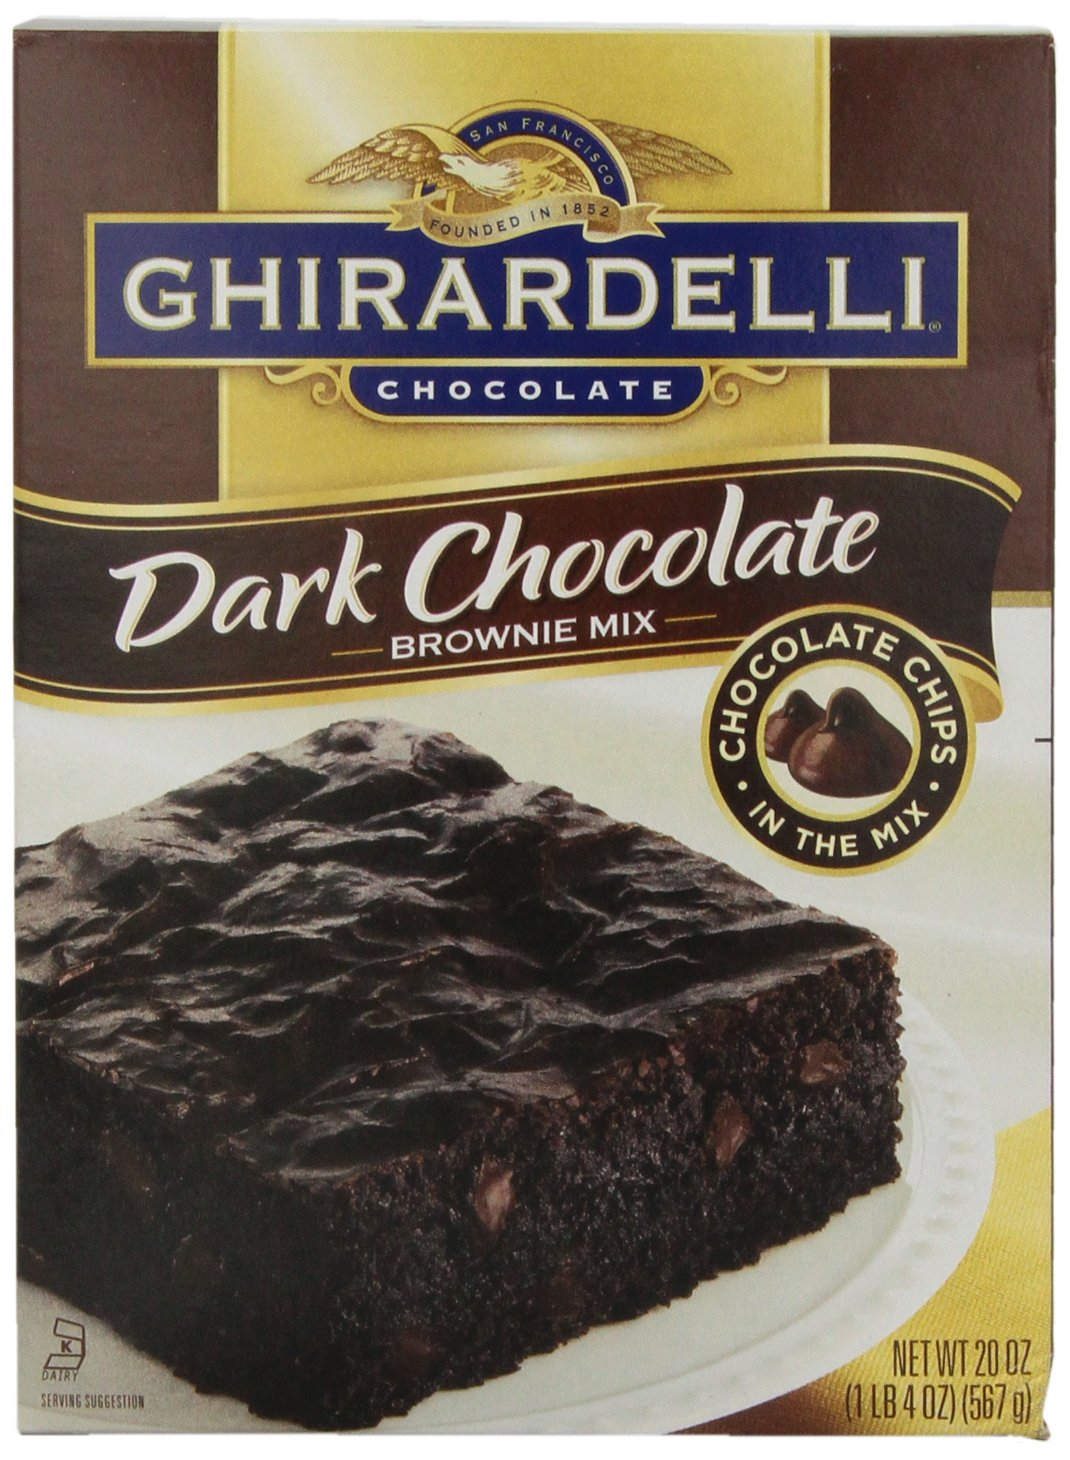 Ghirardelli Dark Chocolate Brownie Mix, 20 oz